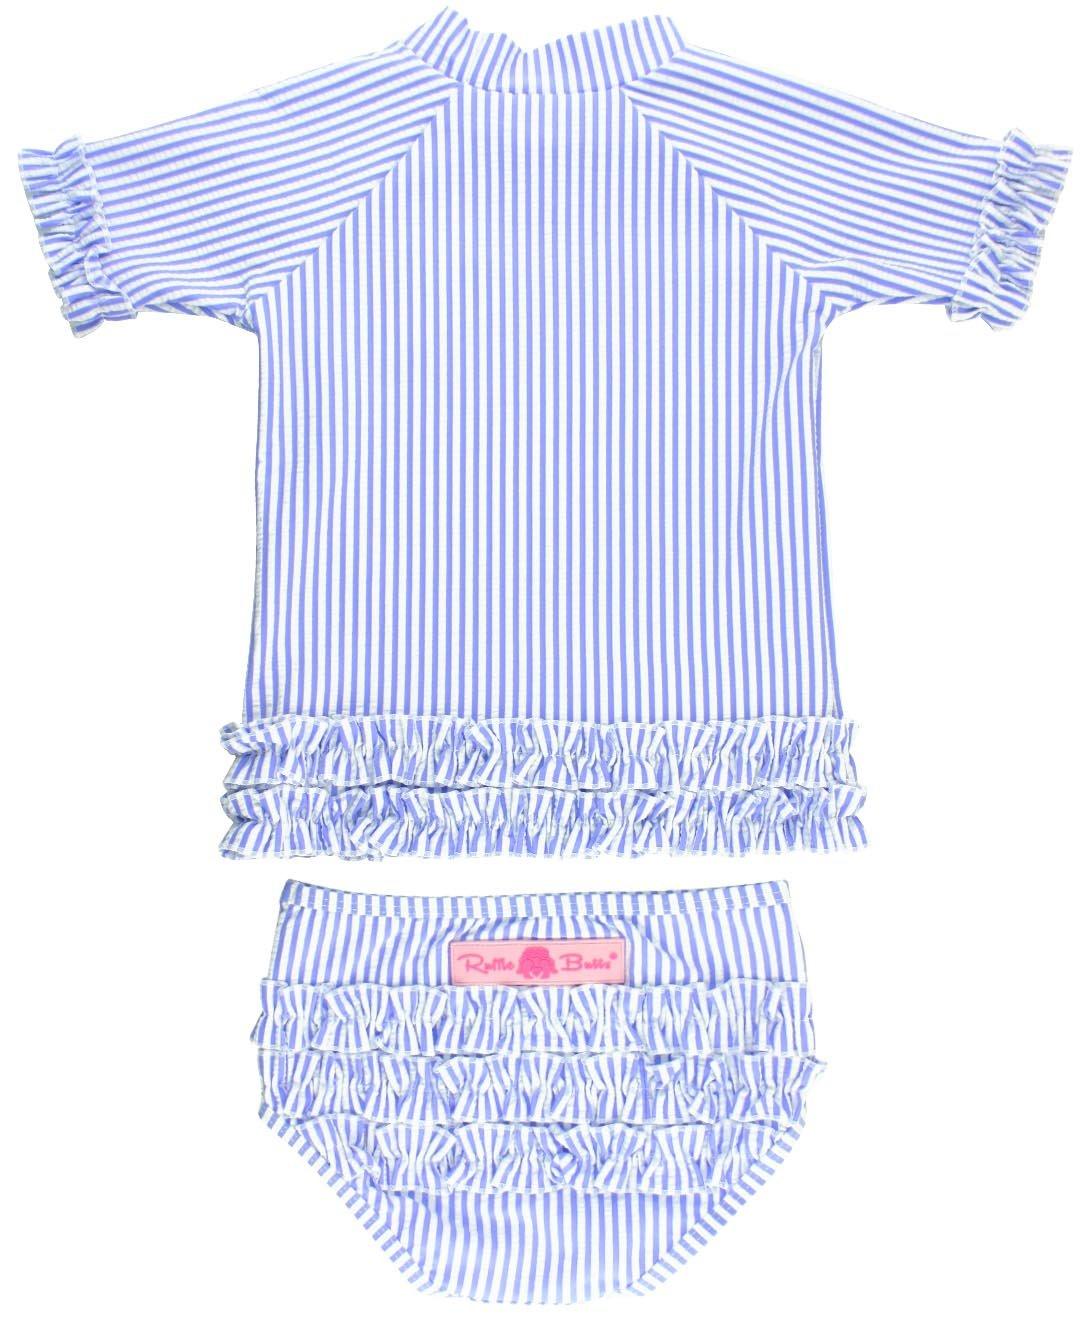 88852ecfe Galleon - RuffleButts Little Girls 2-Piece Swimsuit Set - Blue Seersucker  Rash Guard Bikini With UPF 50+ Sun Protection - 3T